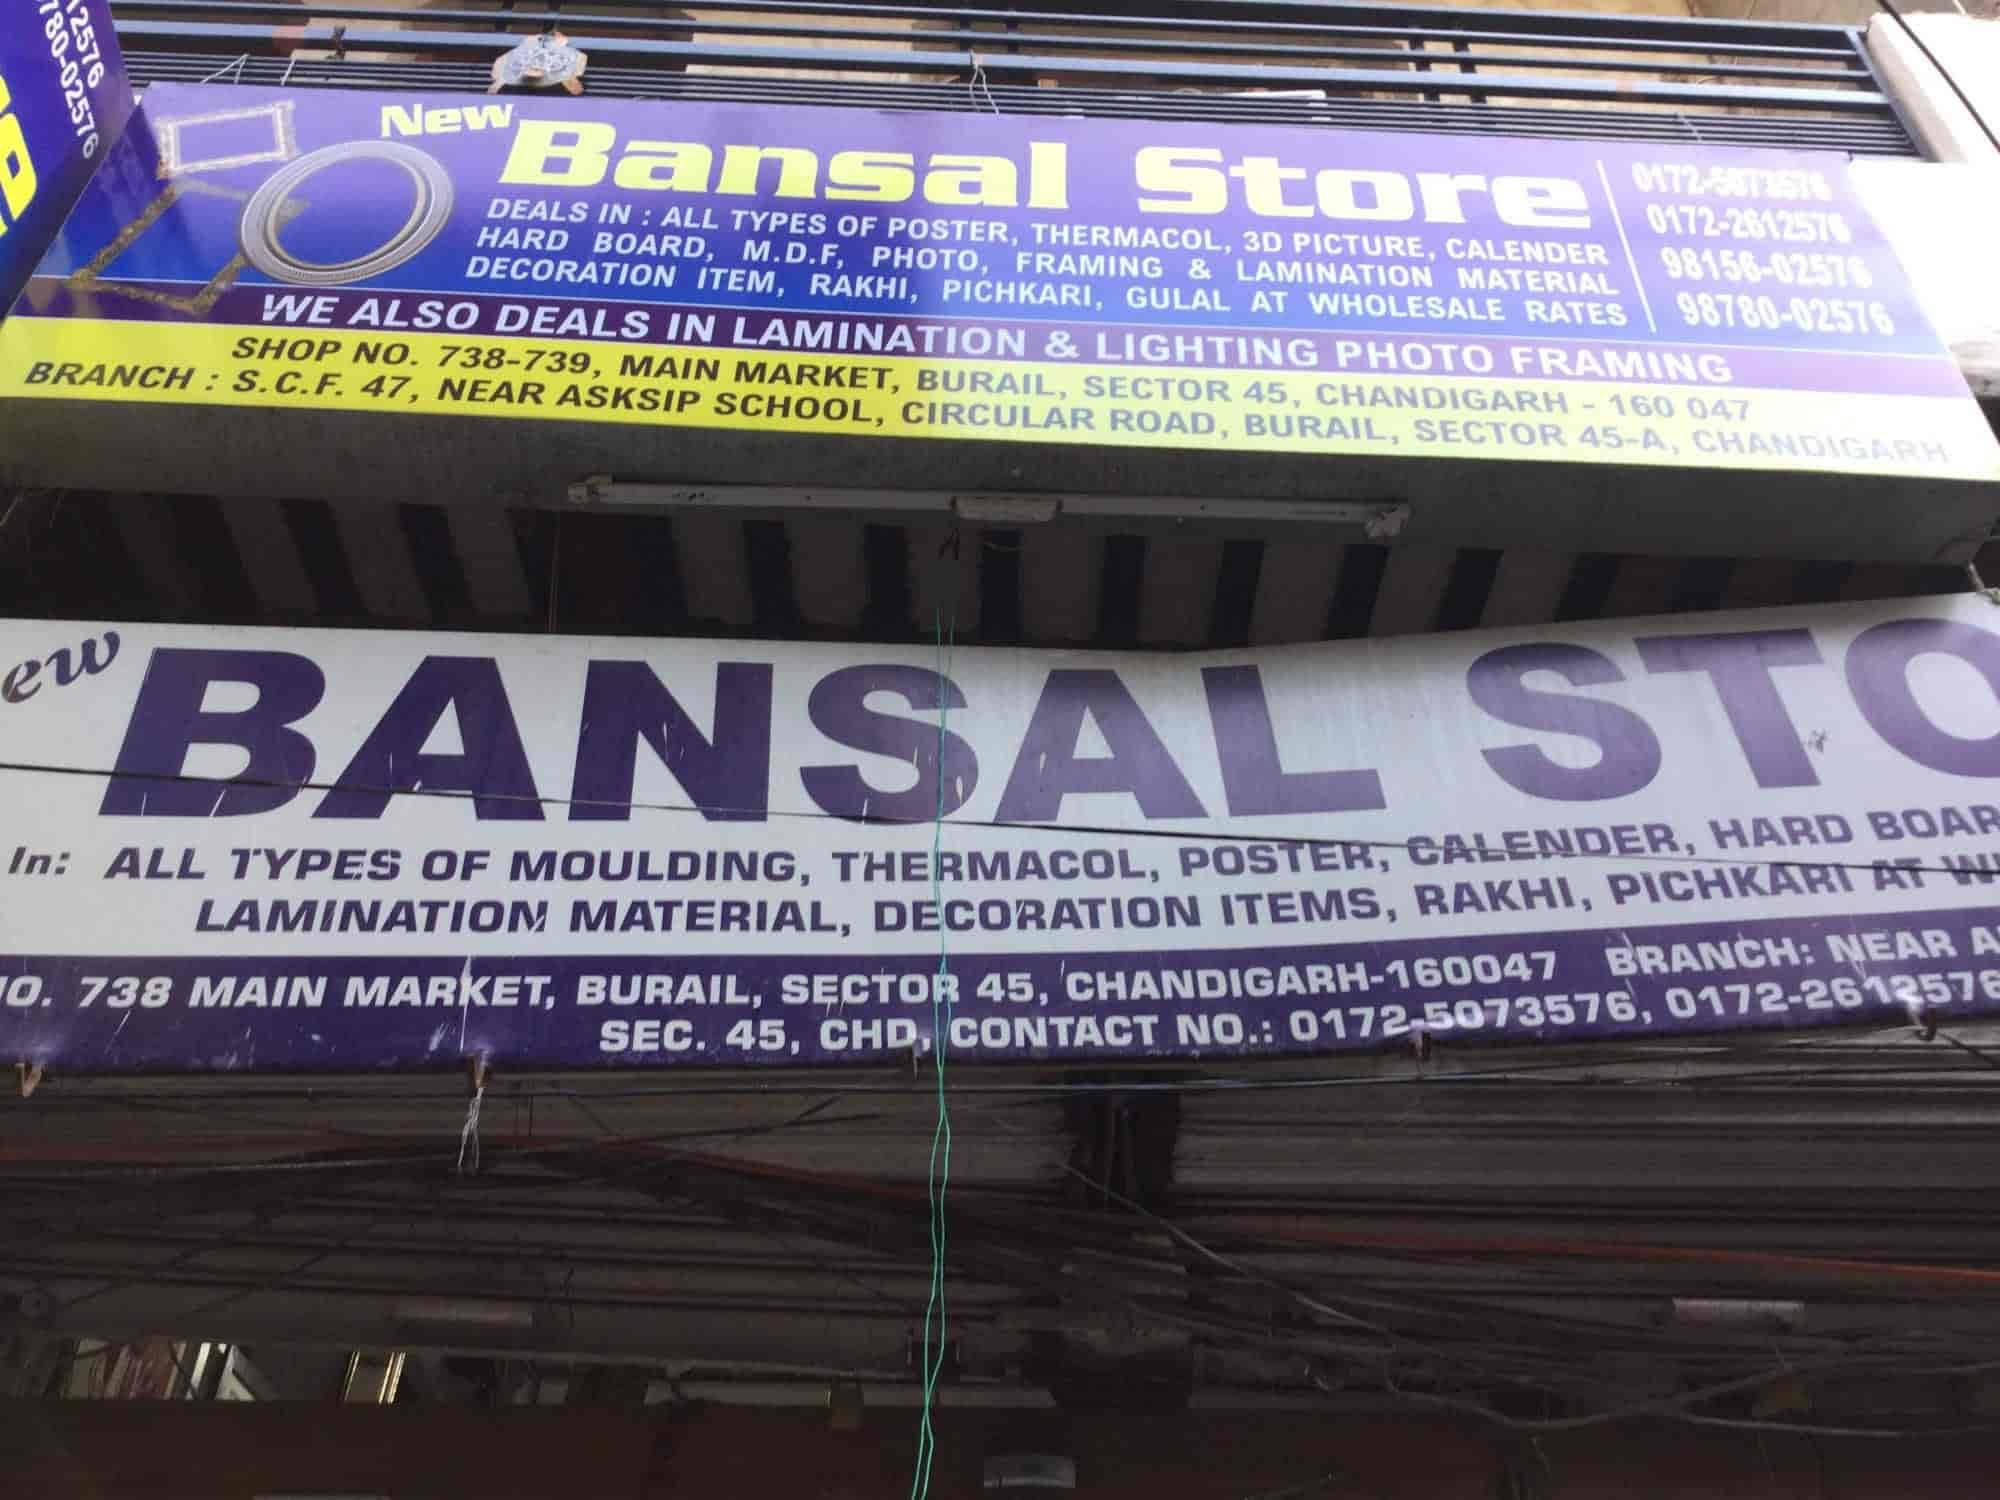 New Bansal Store Photos, Burail Village, Chandigarh- Pictures ...